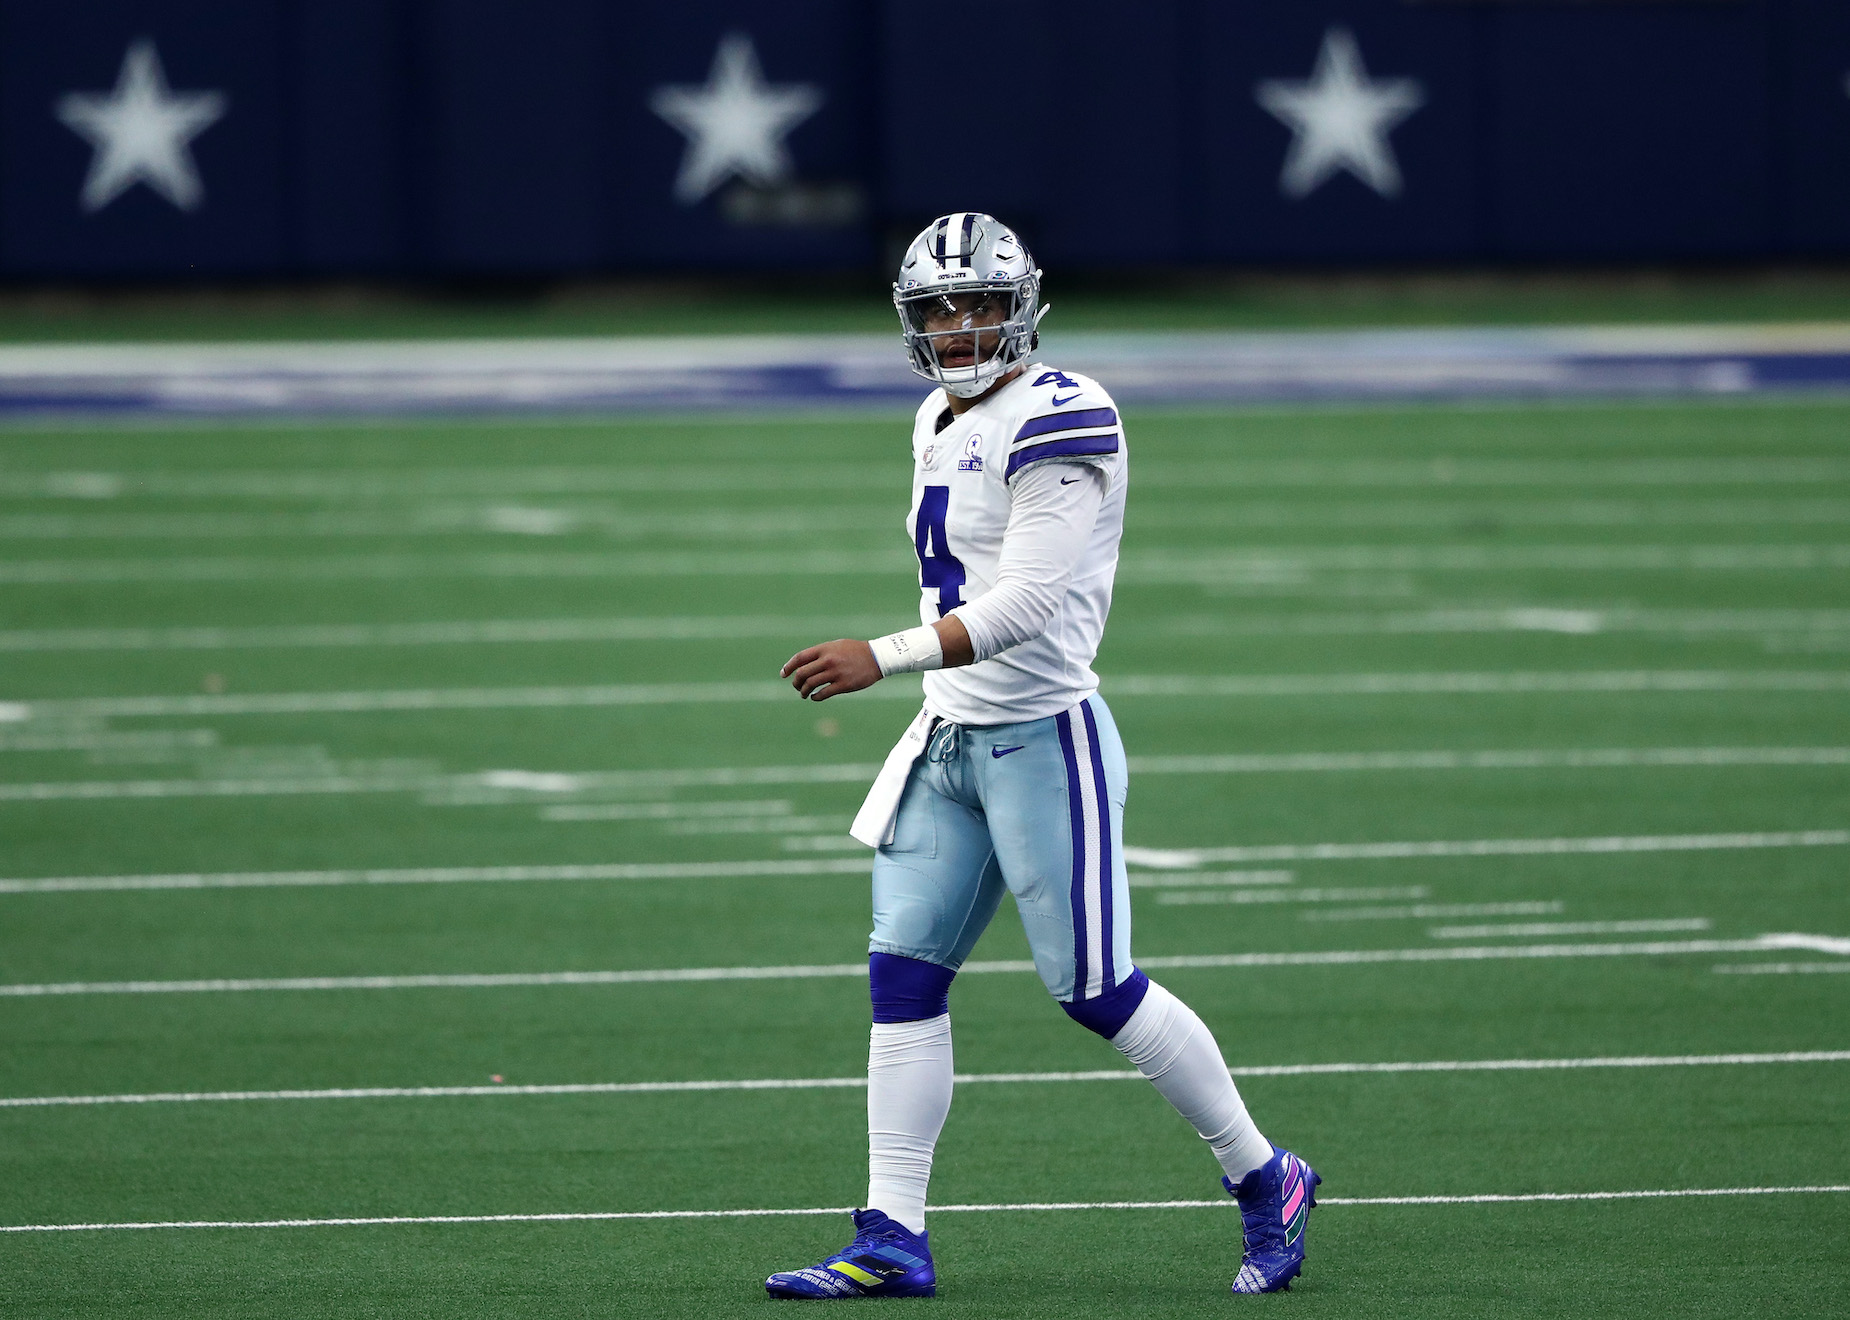 Dallas Cowboy quarterback Dak Prescott walks off the field.